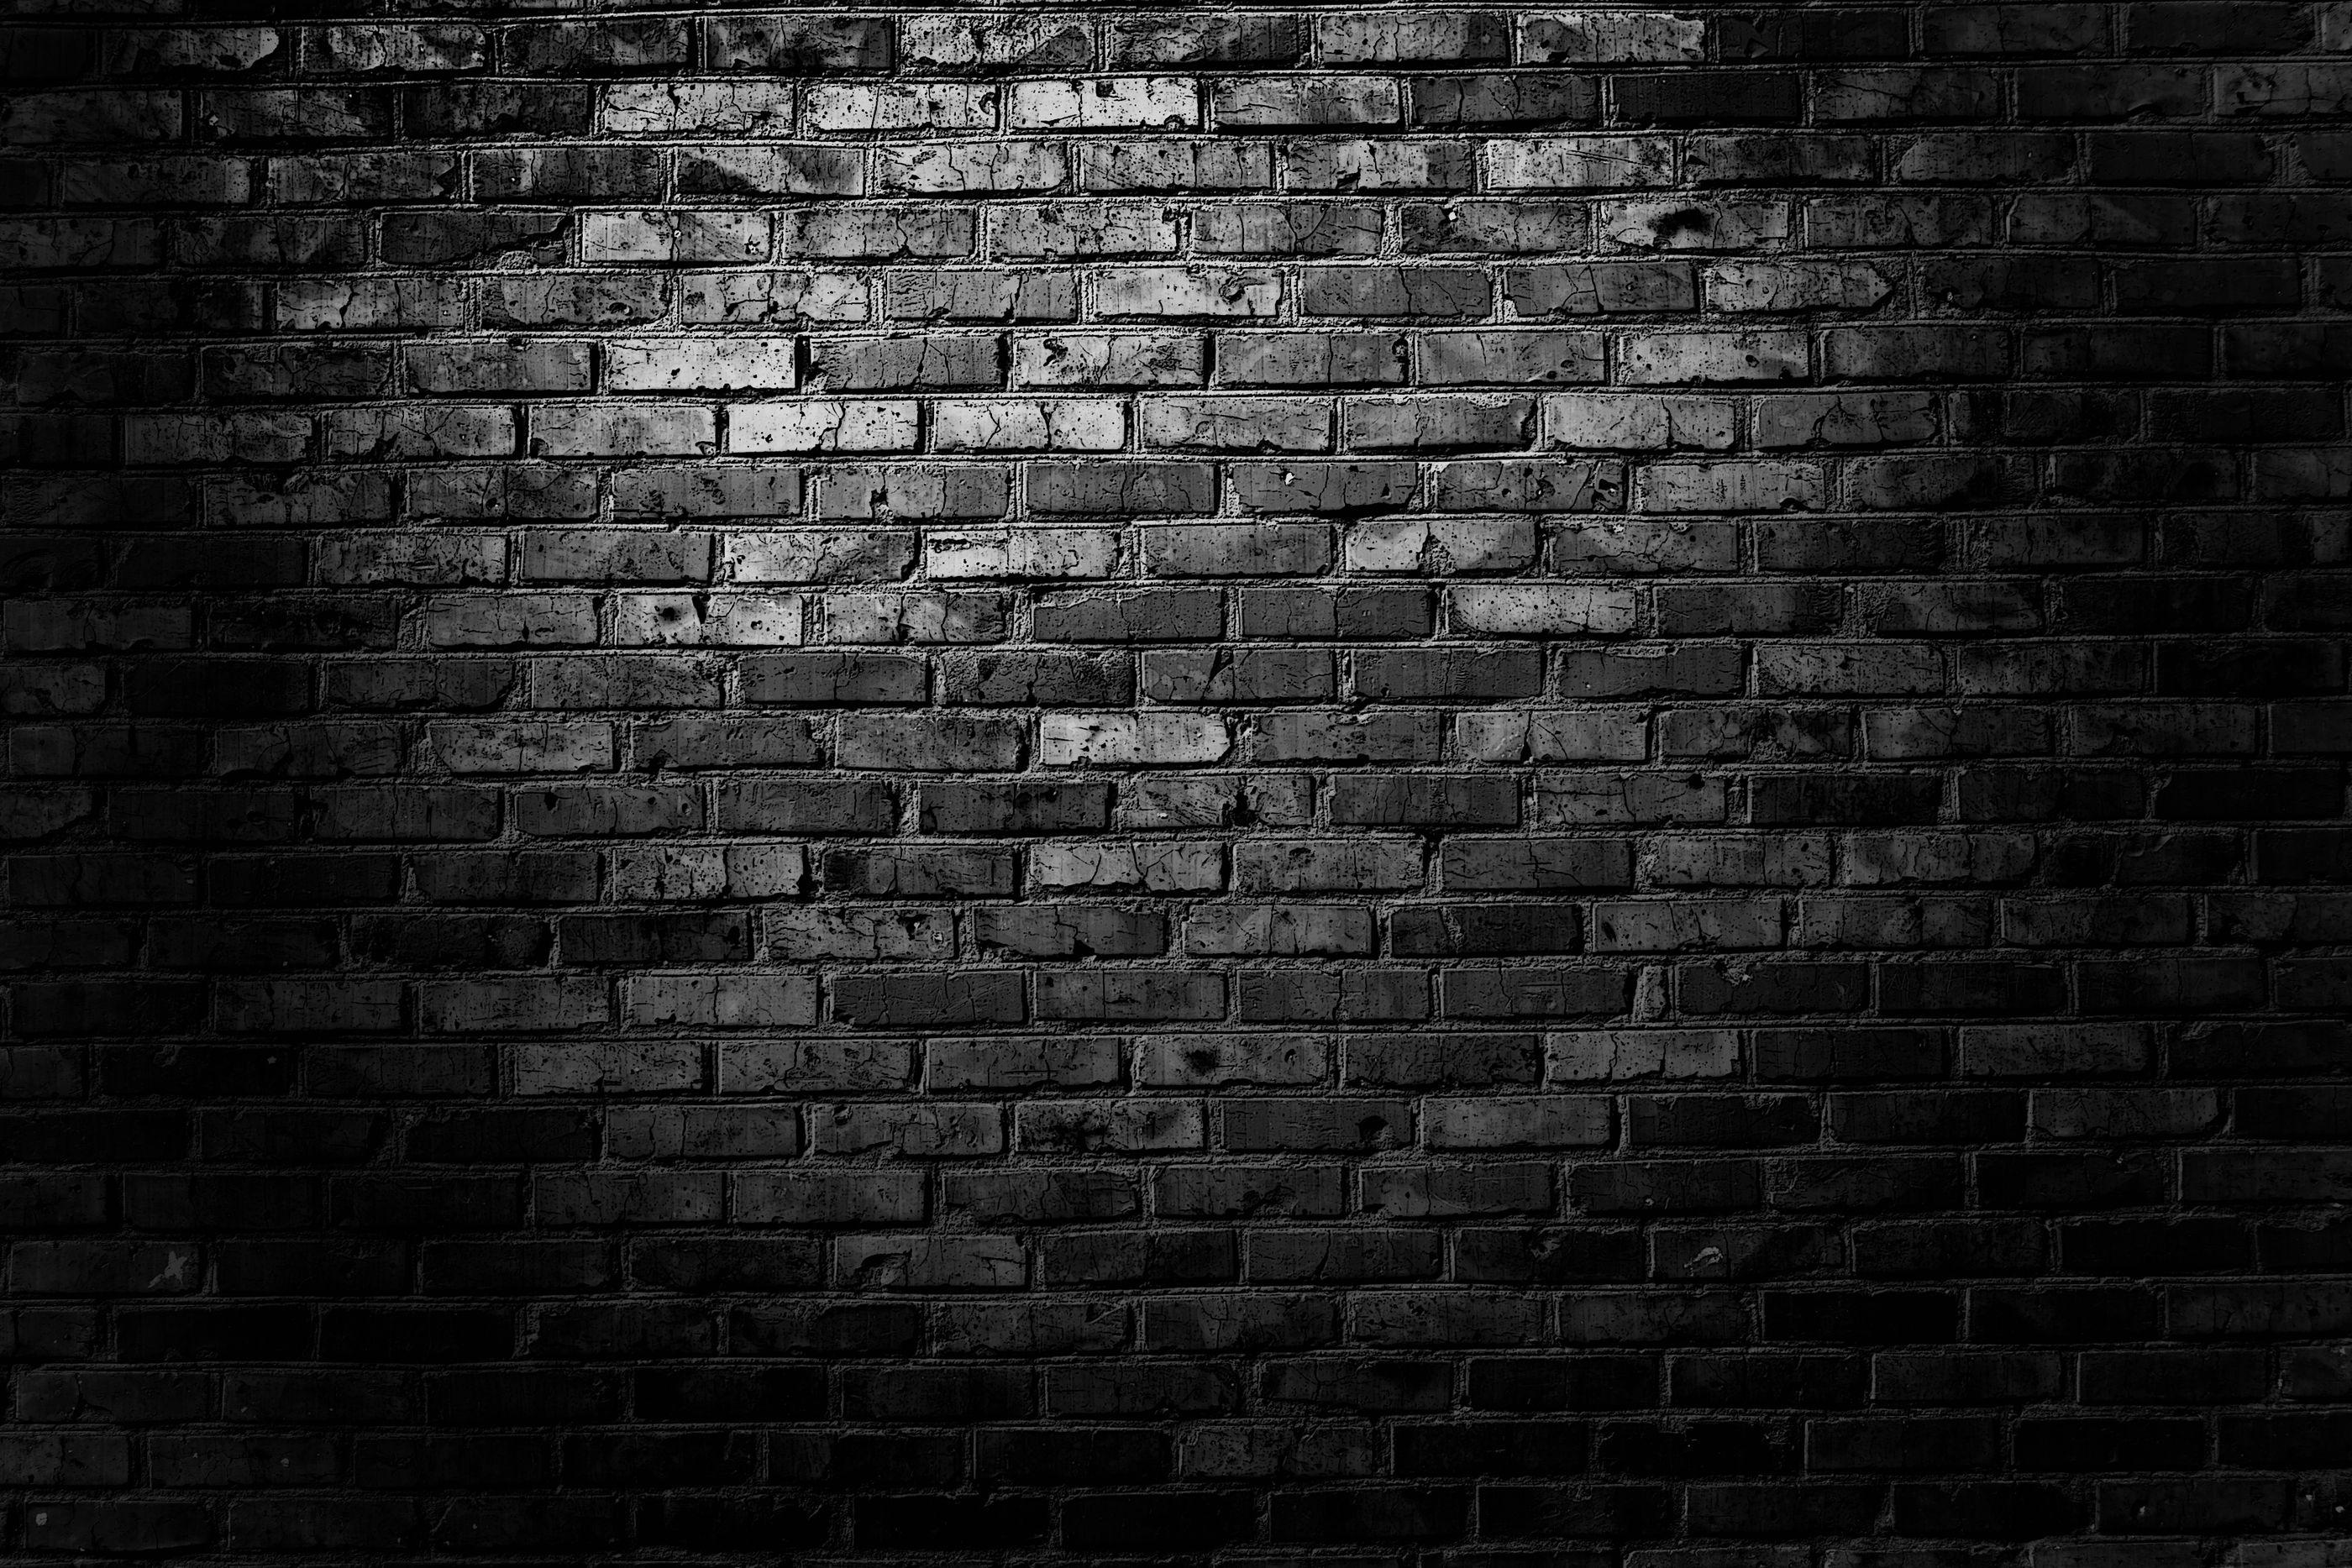 Pin by MMMMxo on O • P • E • N (inspiration) Black brick